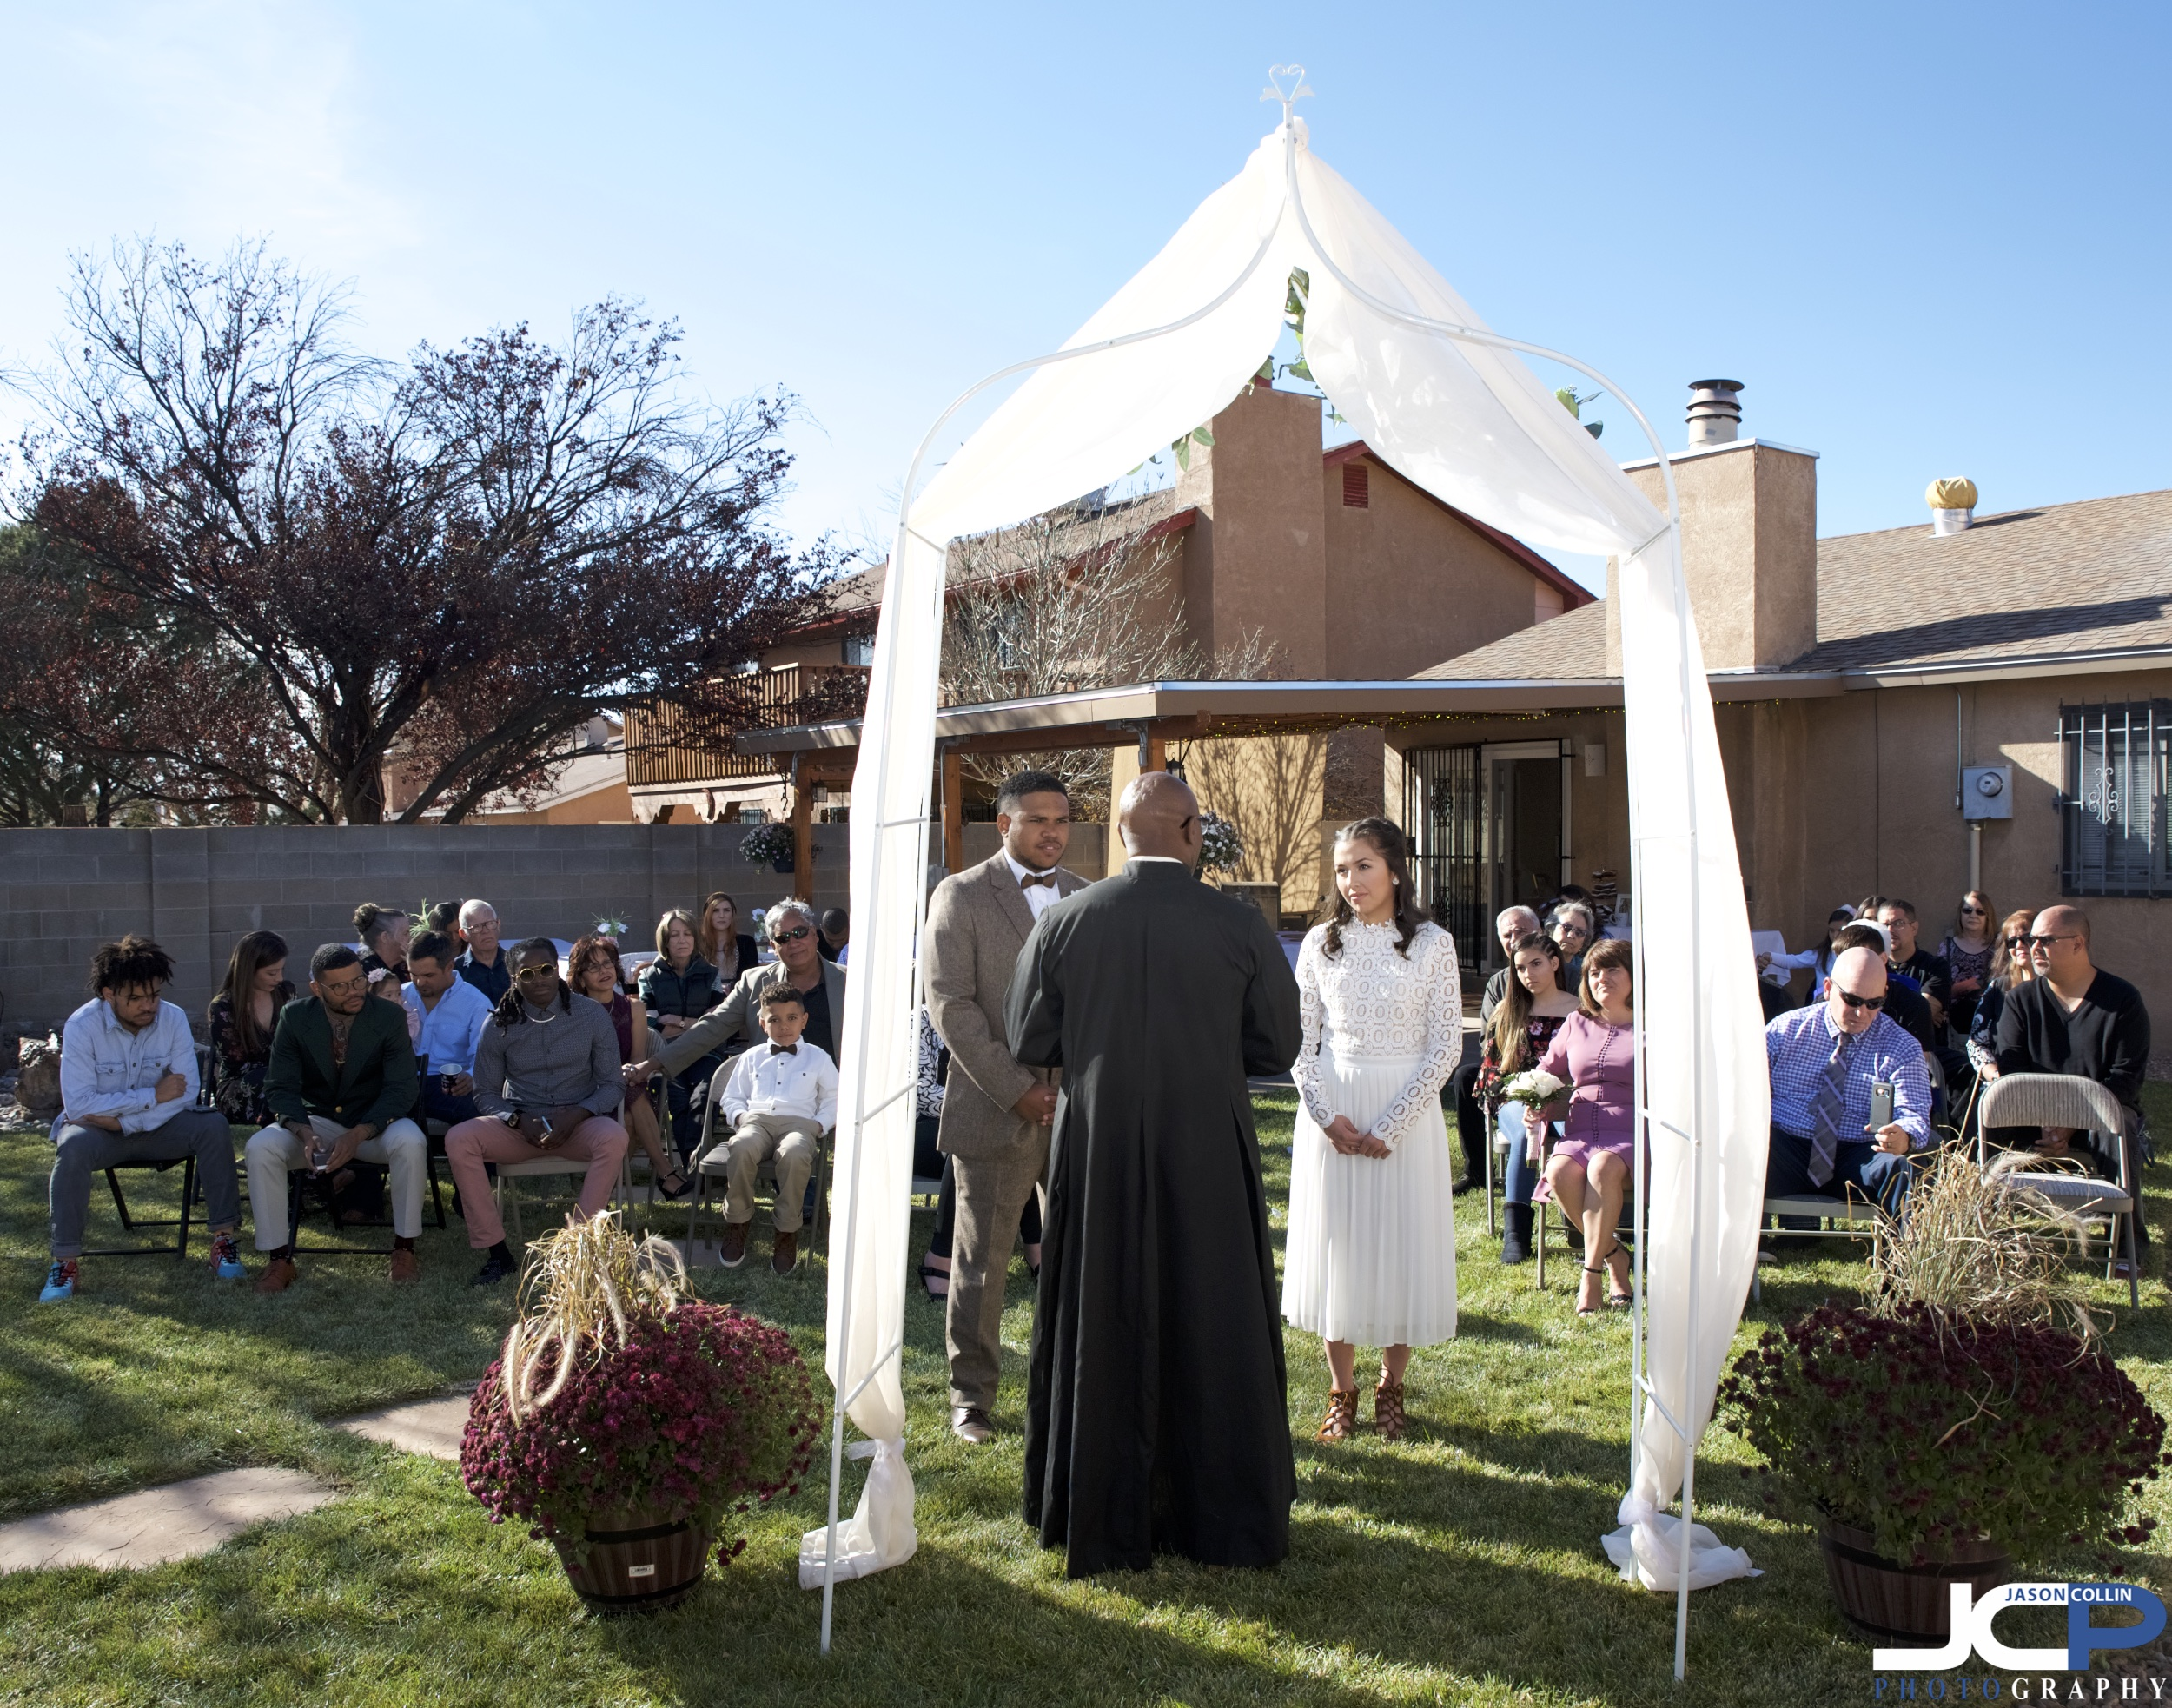 ac-11-17-2018-wedding-113285.jpg